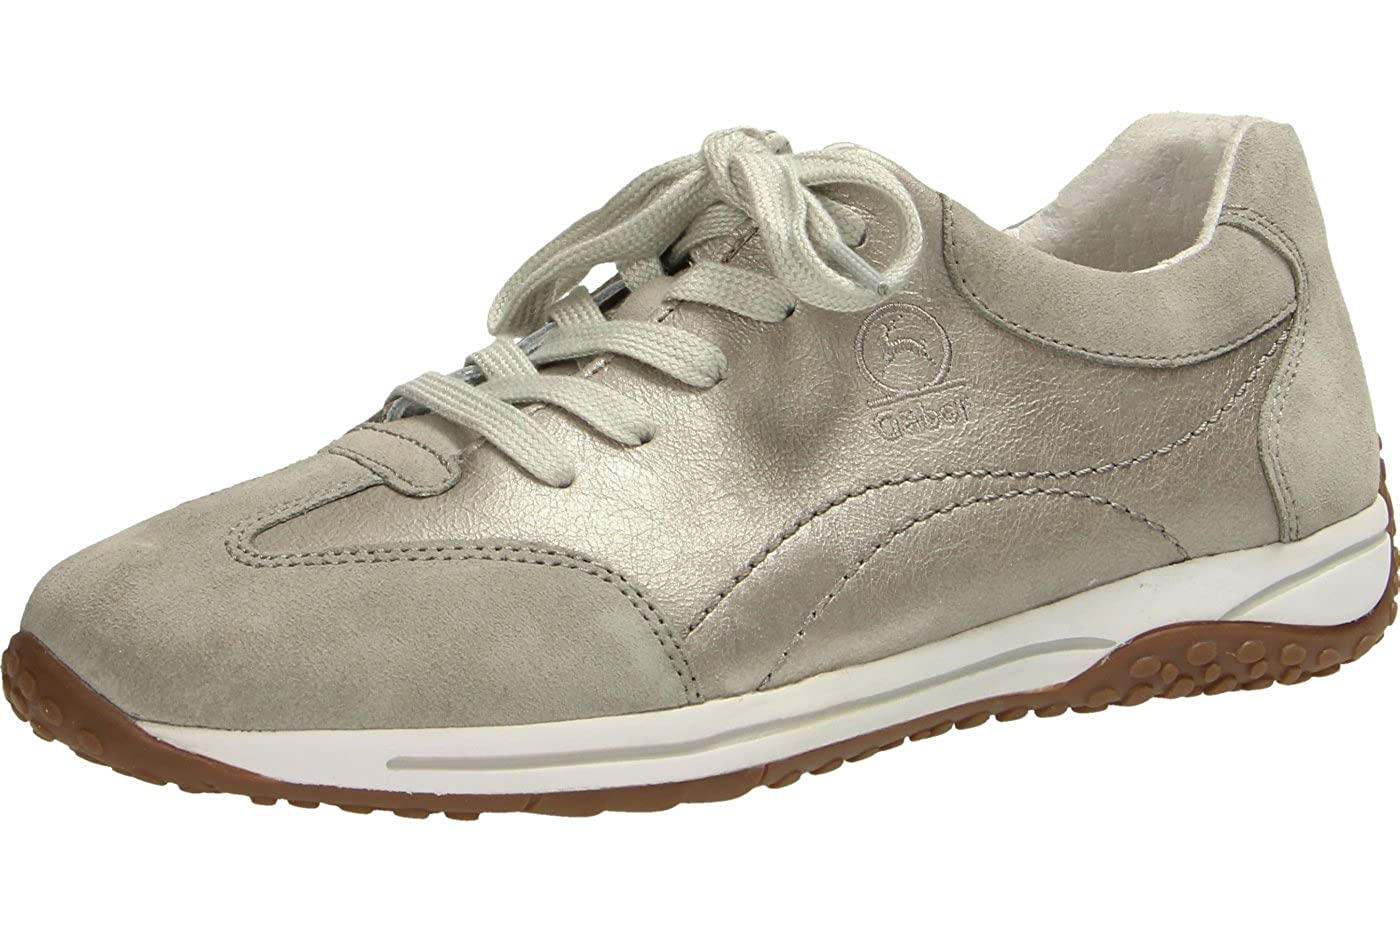 Gabor Damenschuhe 66.385.36 Damen Sneaker, Schnürer, Schnürhalbschuhe, mit Reissverschluss   Reissverschluss Argento/Hellgrau 37e7c2